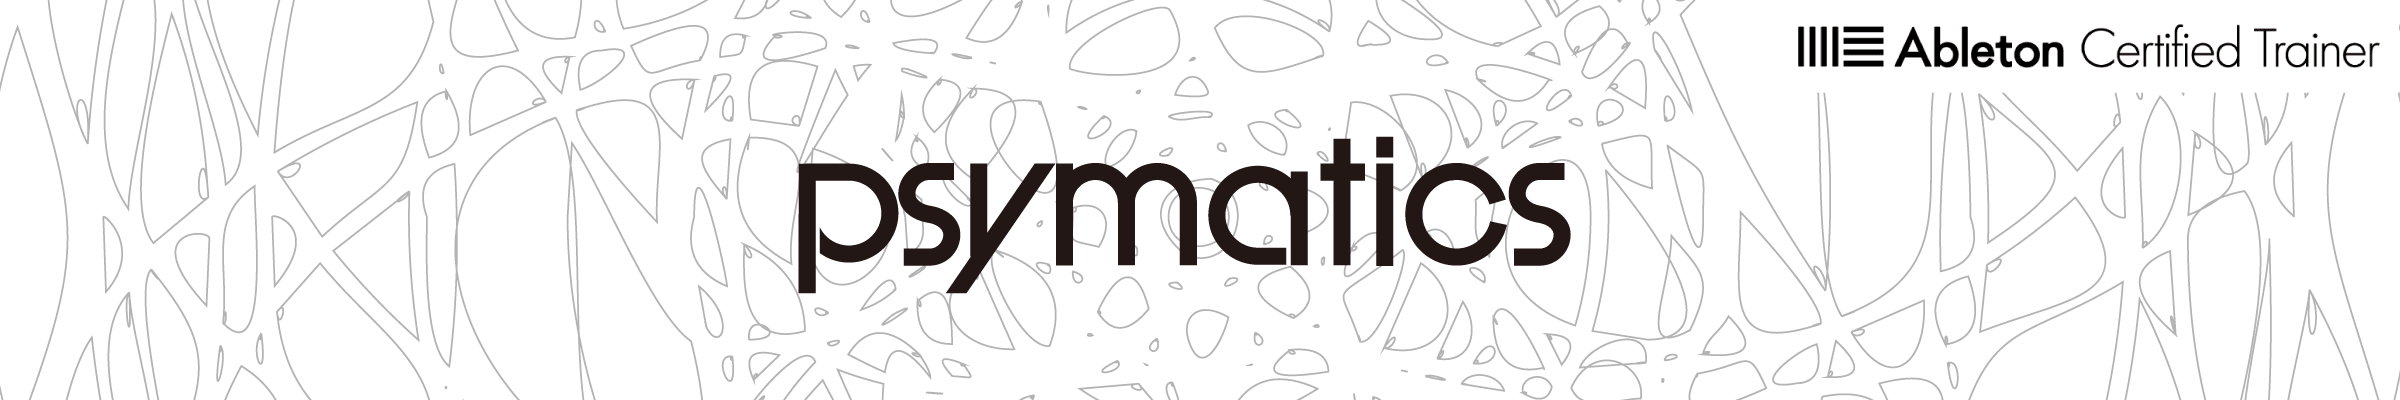 psymatics